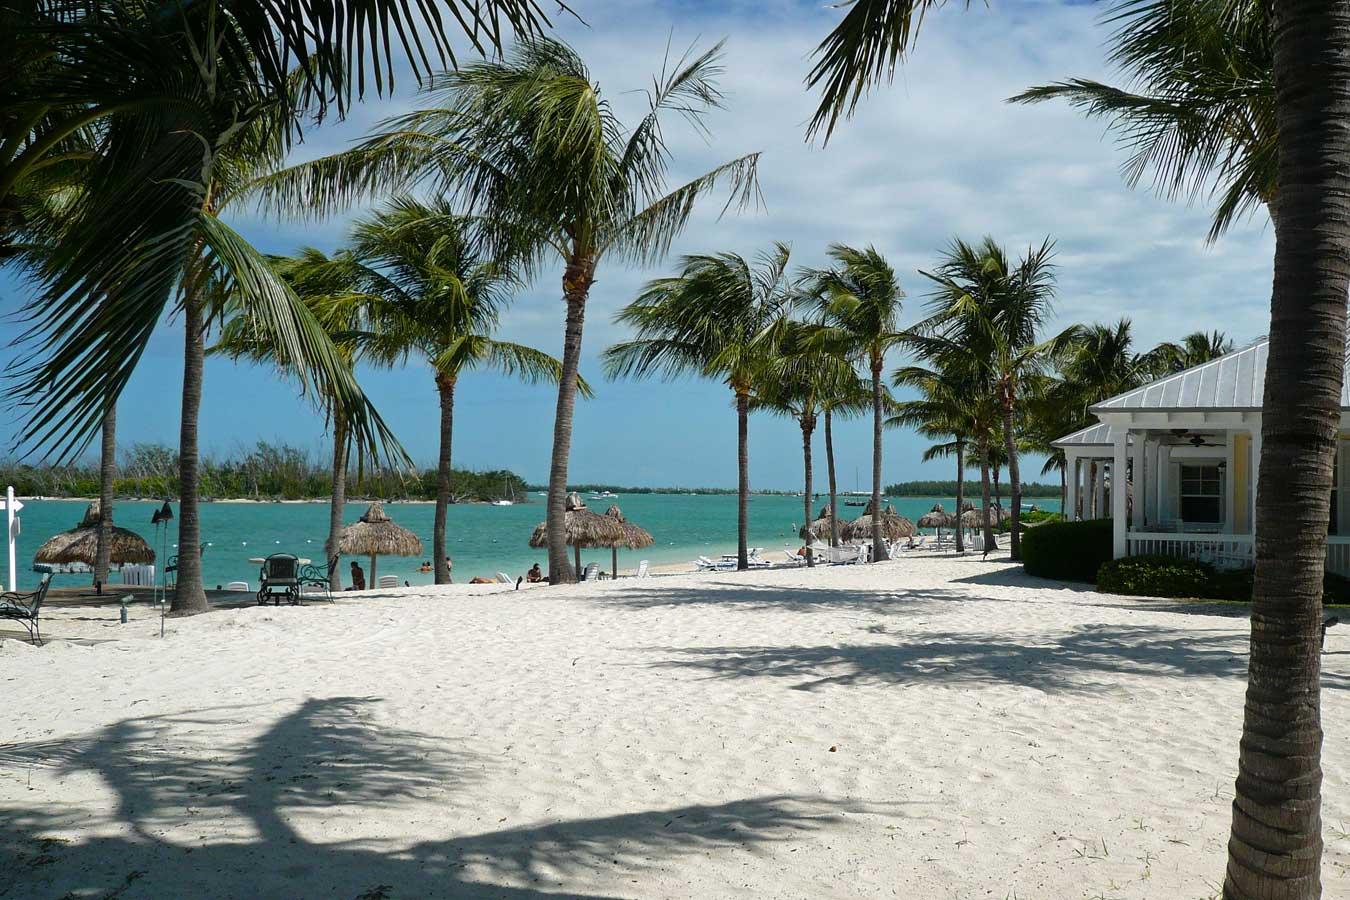 Sunset Key Guest Cottages, Key West - Reisebuchung und Reiseberatung bei TRAVELBAR